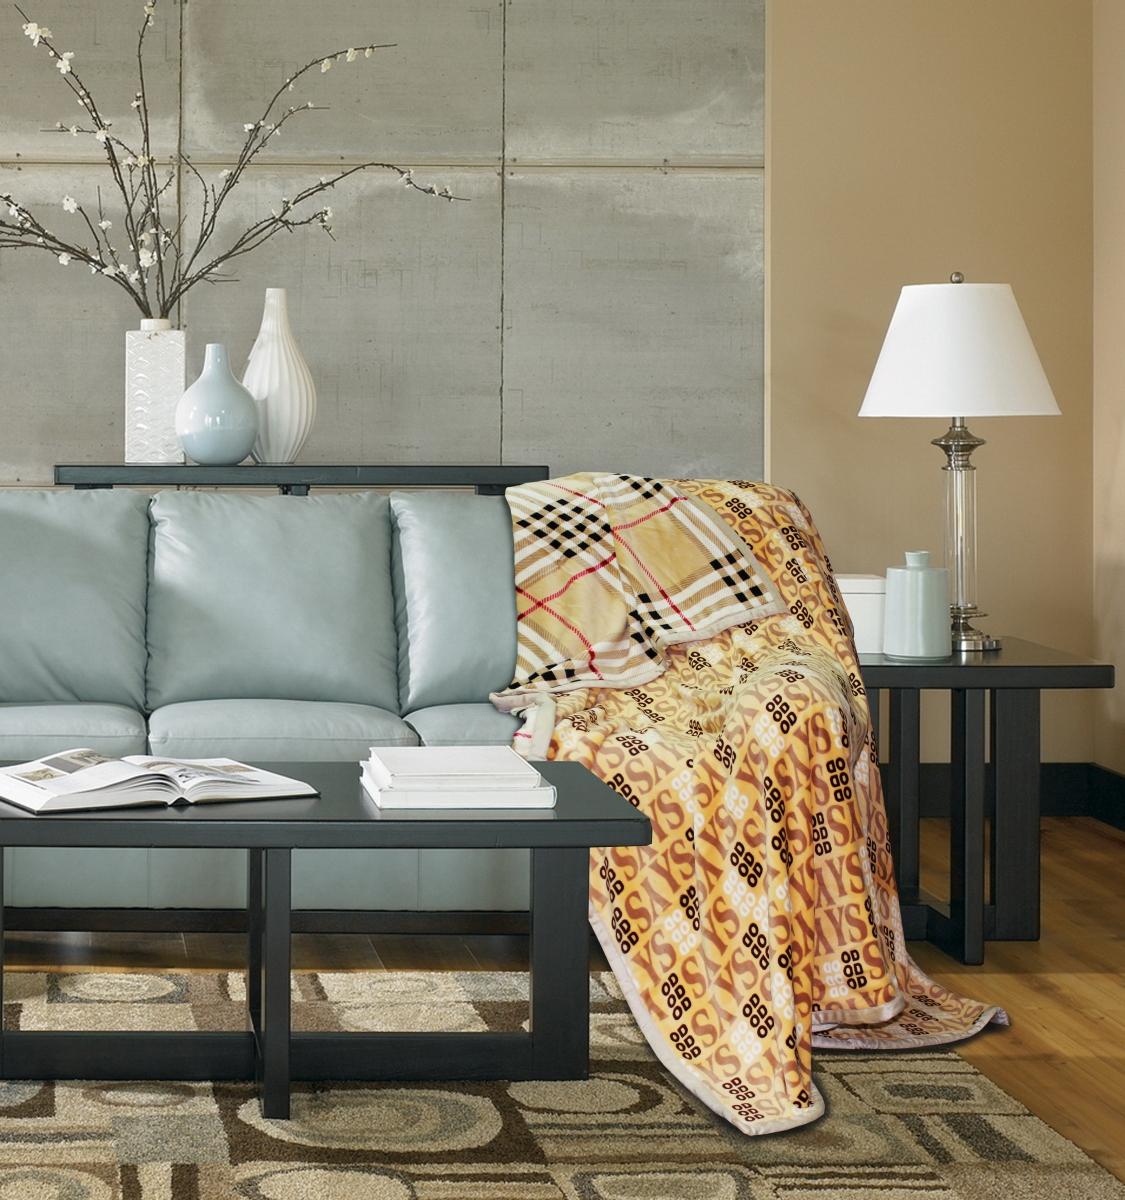 "Плед Amore Mio ""Фланель. Burberry. Status"", цвет: бежевый, коричневый, черный, 180 х 220 см"